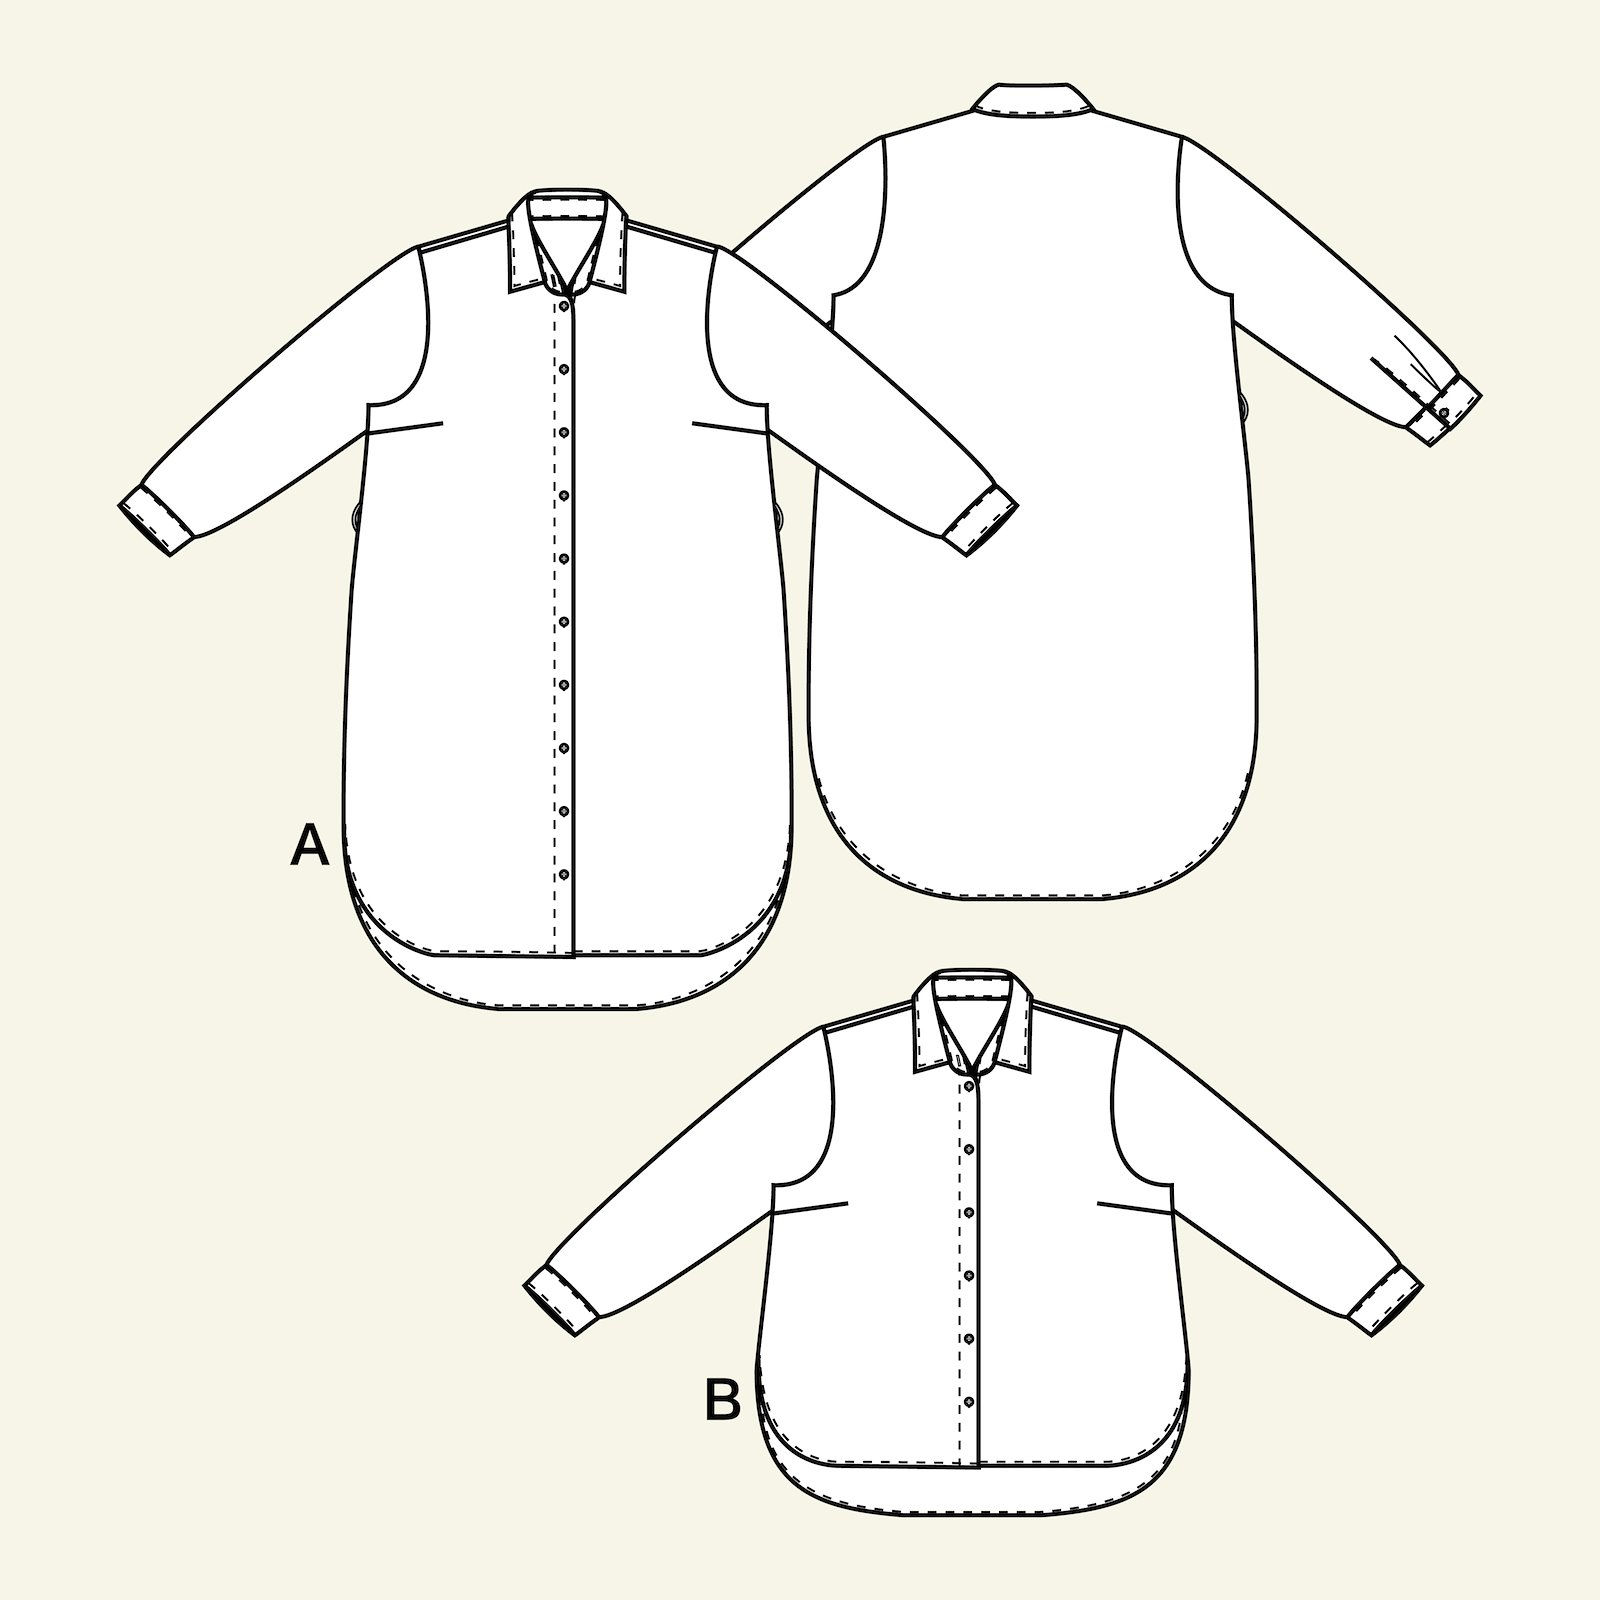 Shirtdress and shirt, 50/22 p73012_pack